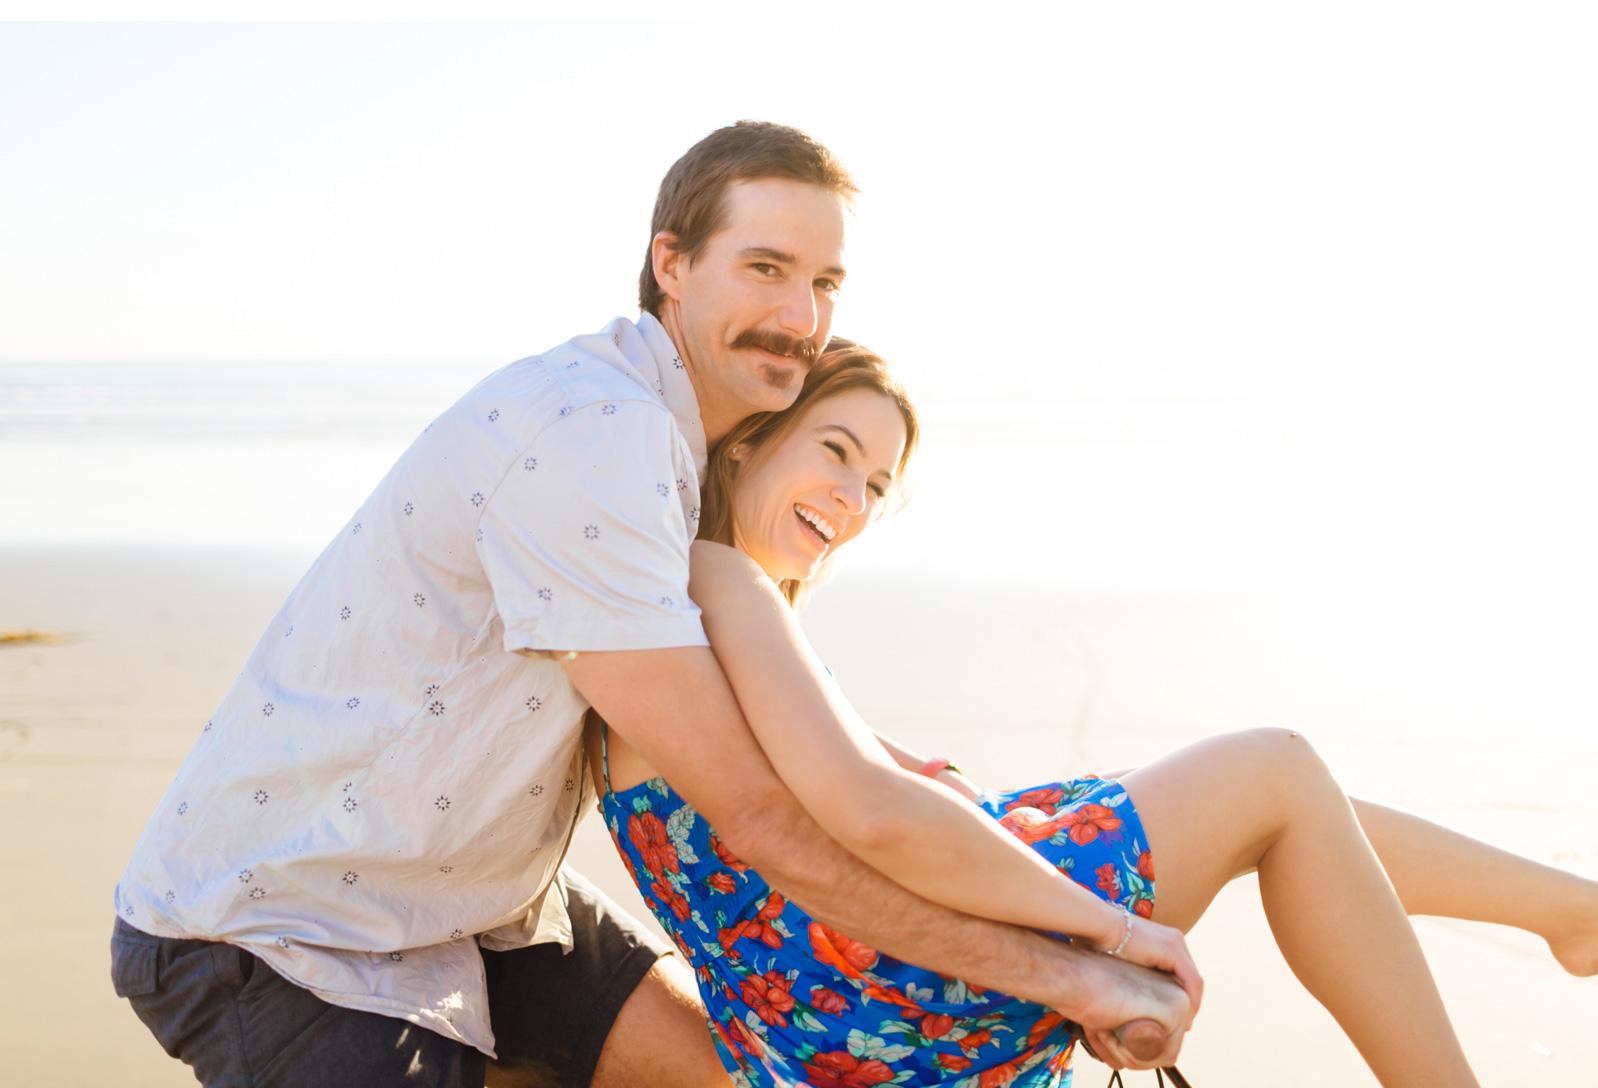 San-Luis-Obispo-Wedding-Photographer-Natalie-Schutt-Photography_24.jpg